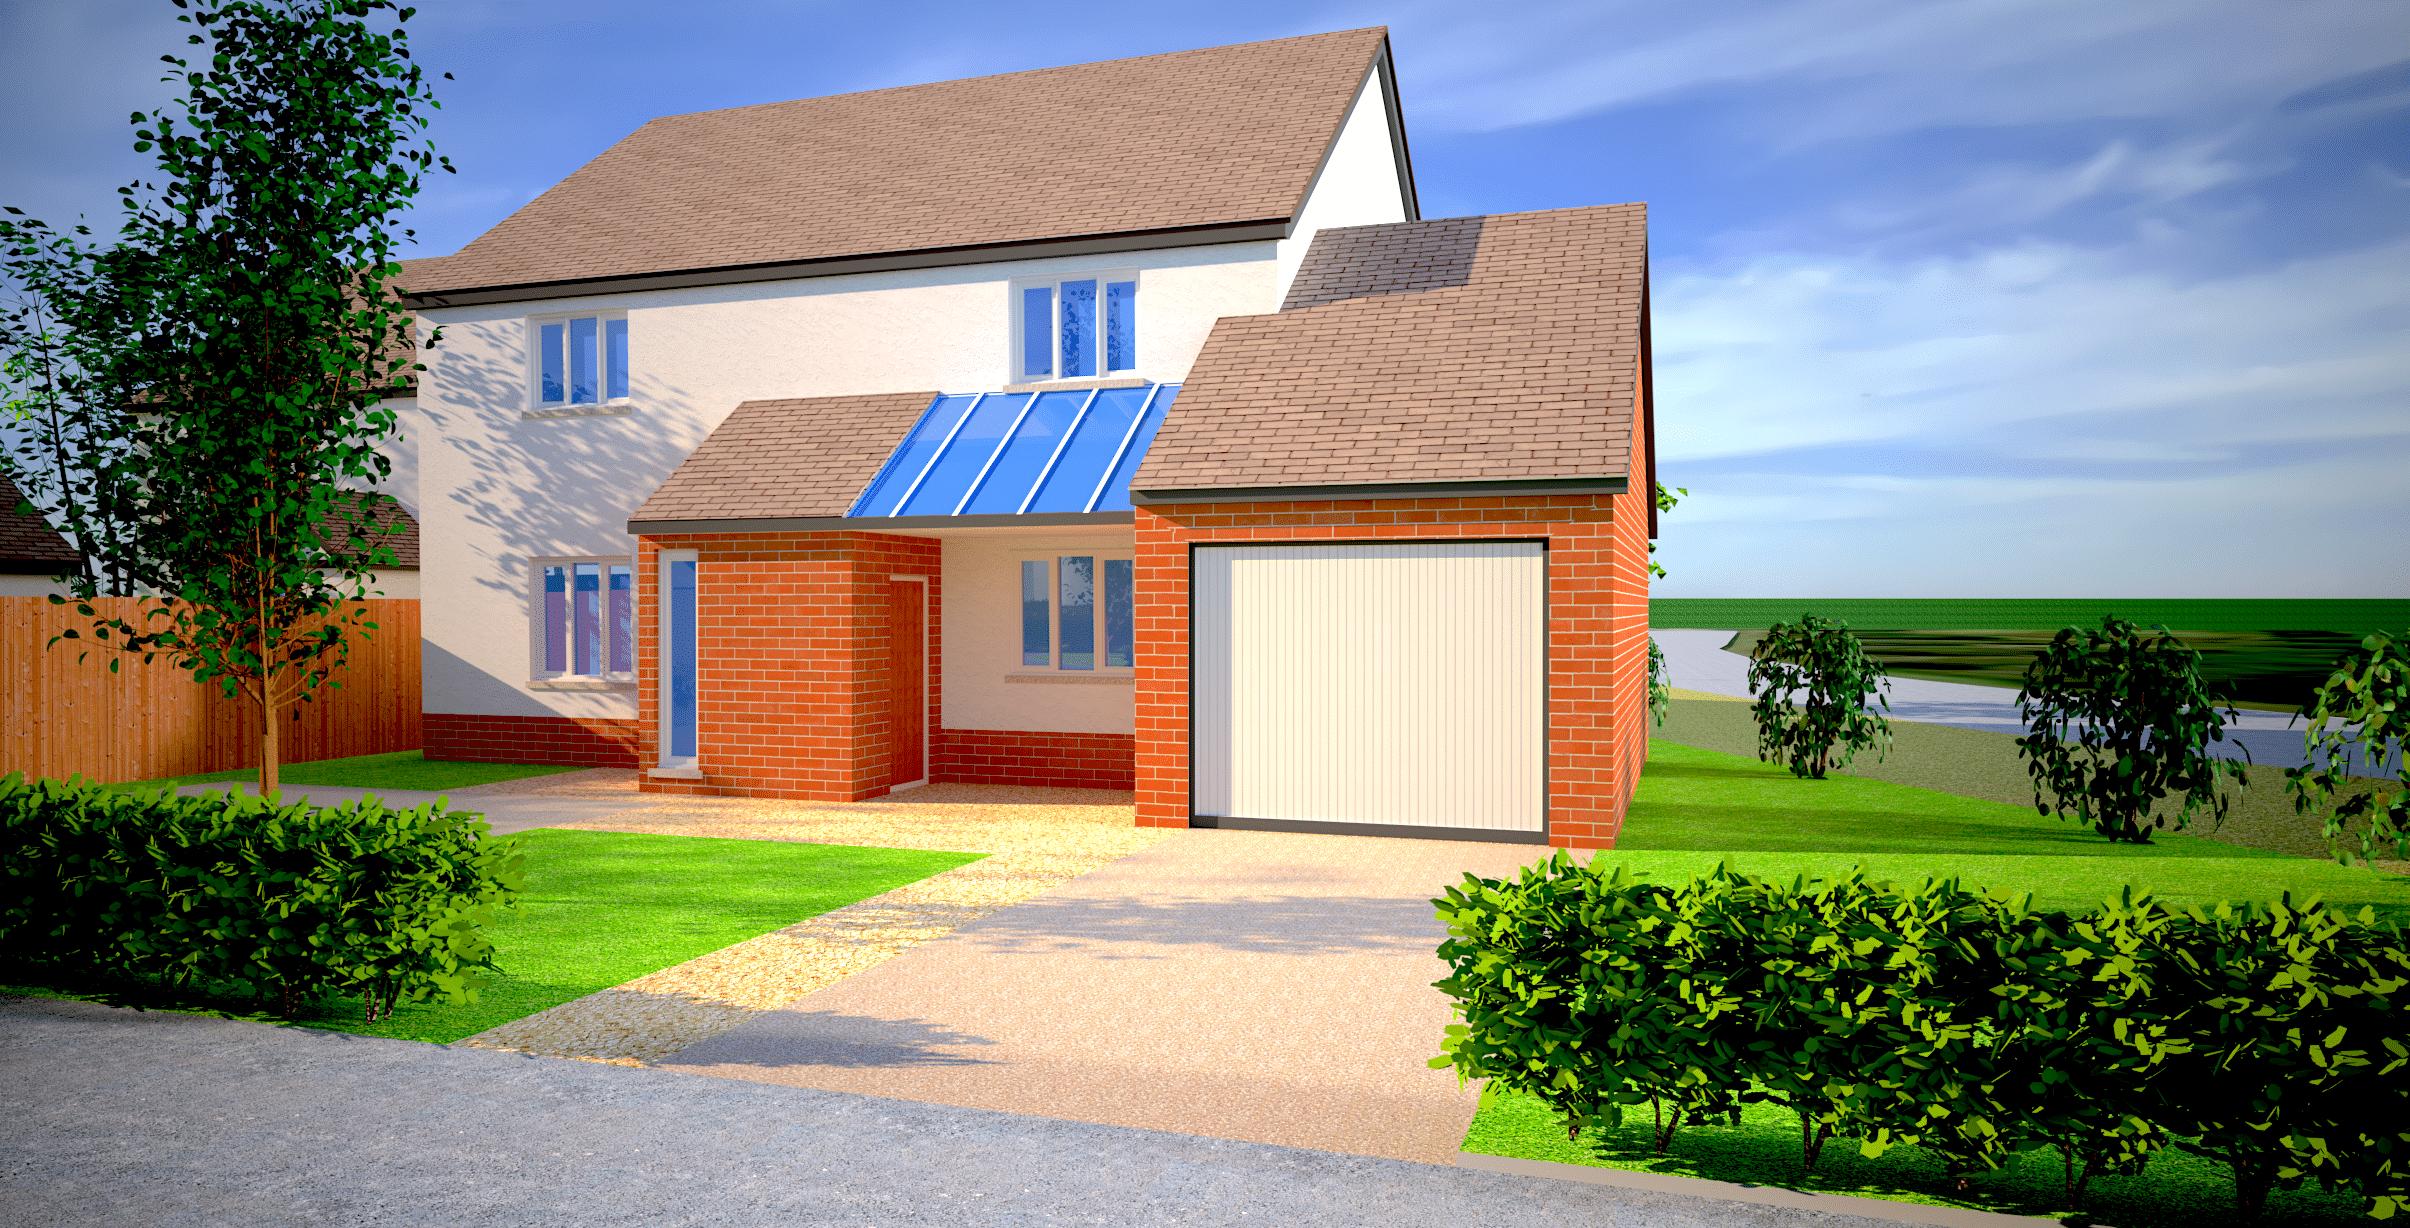 ebbw vale housing development 3d visuals